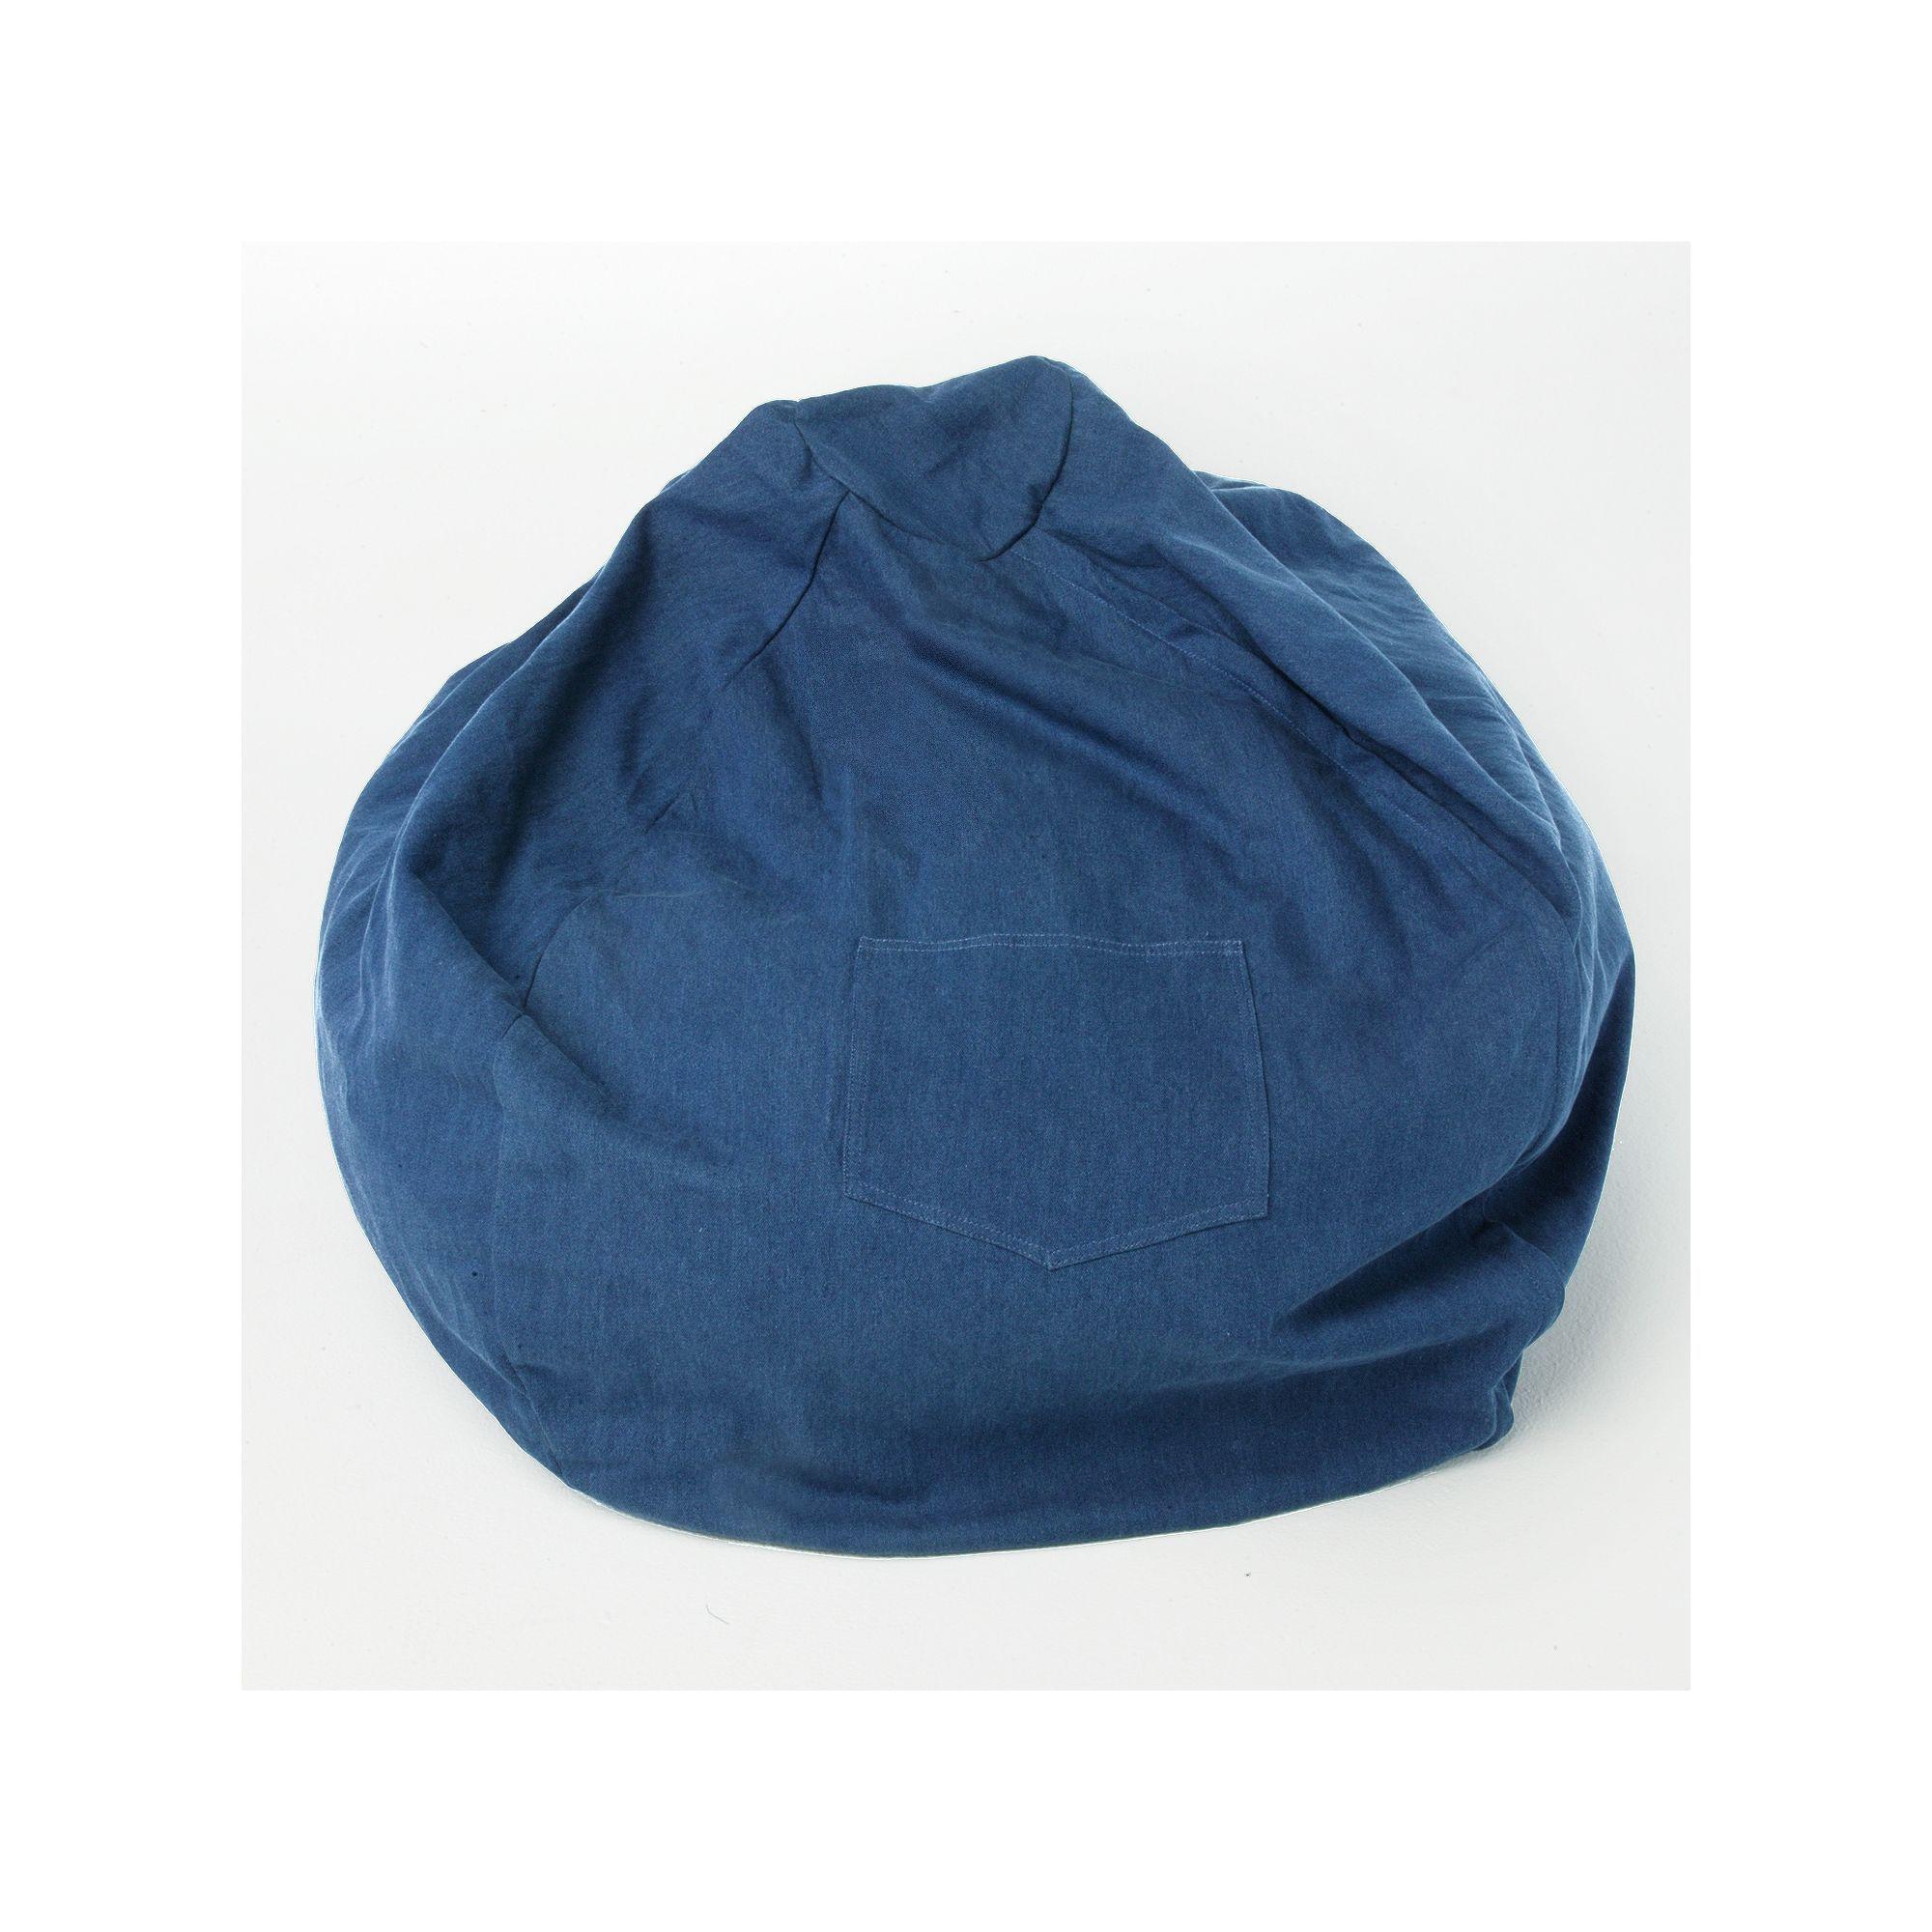 Fun Furnishings Blue Denim Large Beanbag Chair